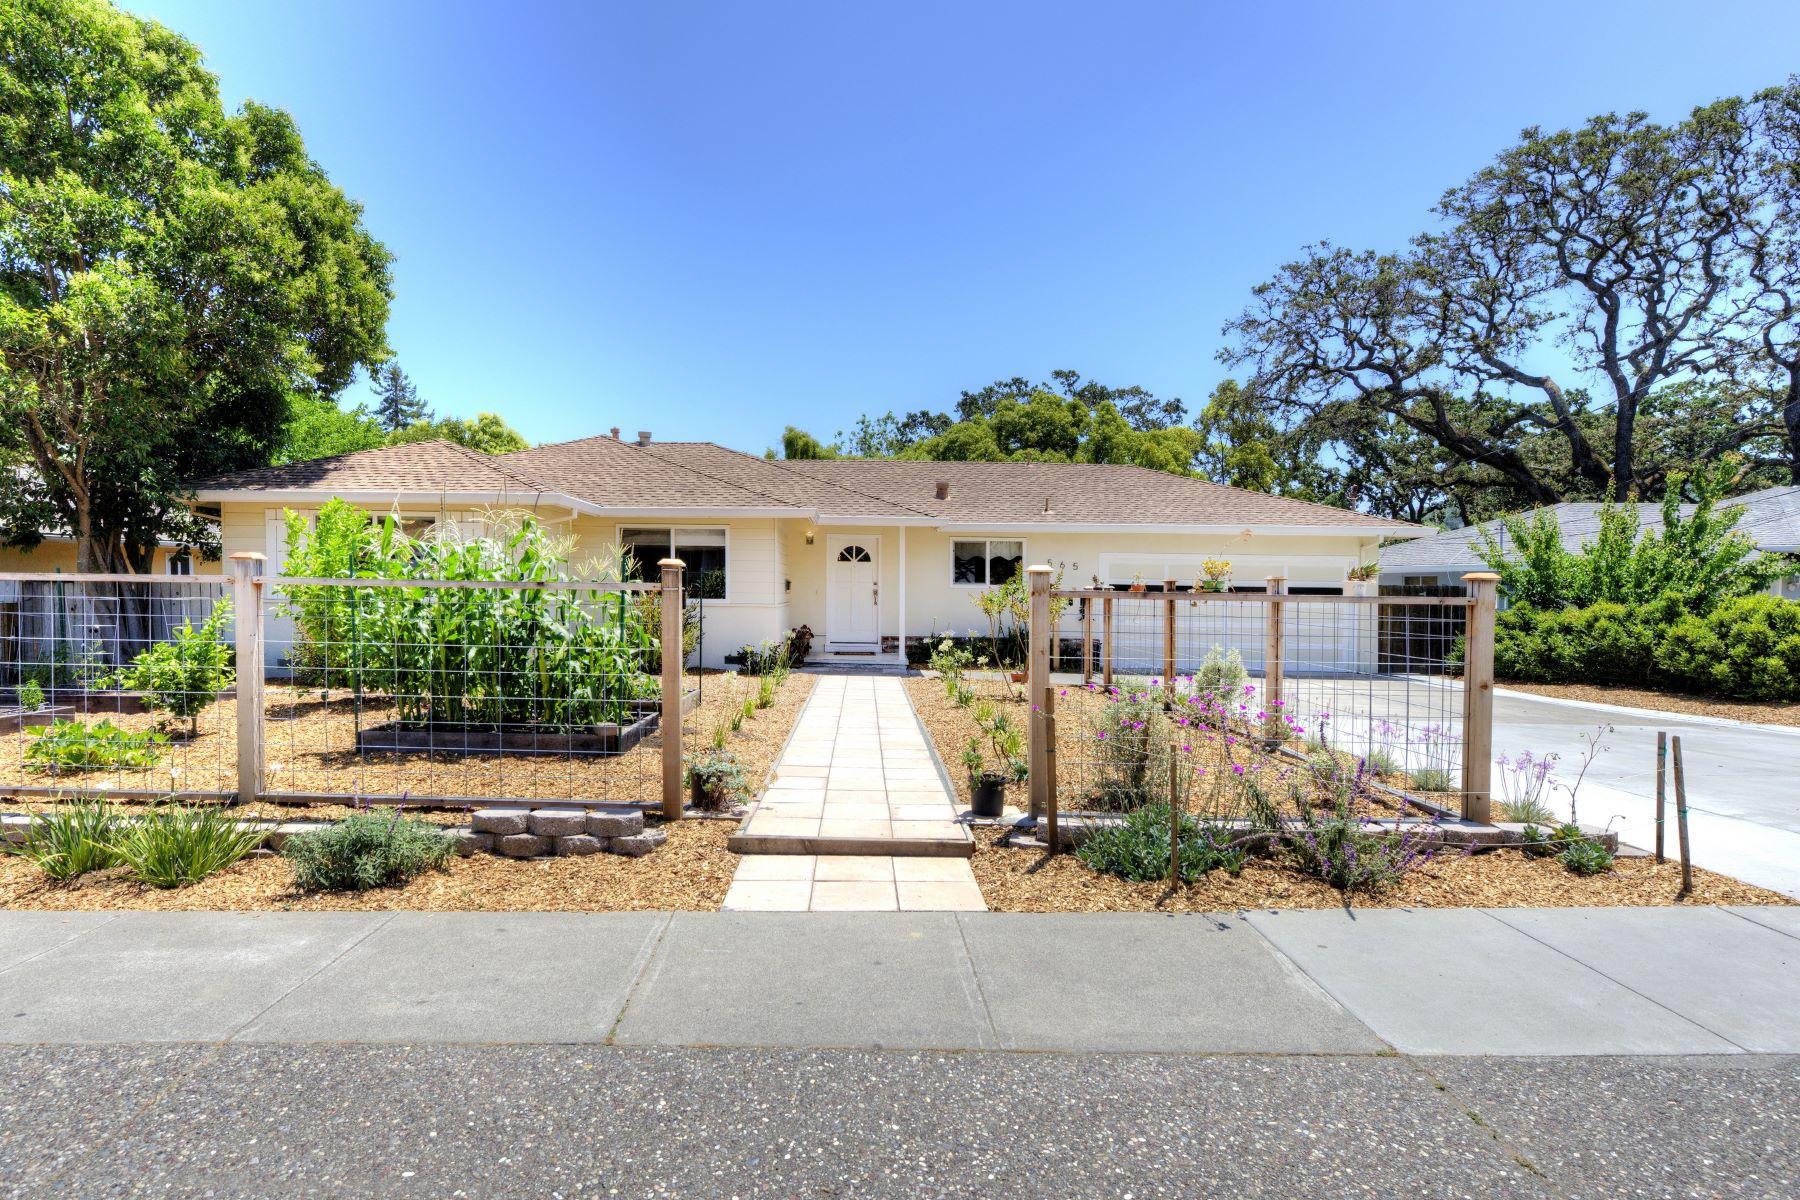 Single Family Home for Sale at Charming Single-Level Southern Novato Home 565 Arthur Street Novato, California 94947 United States